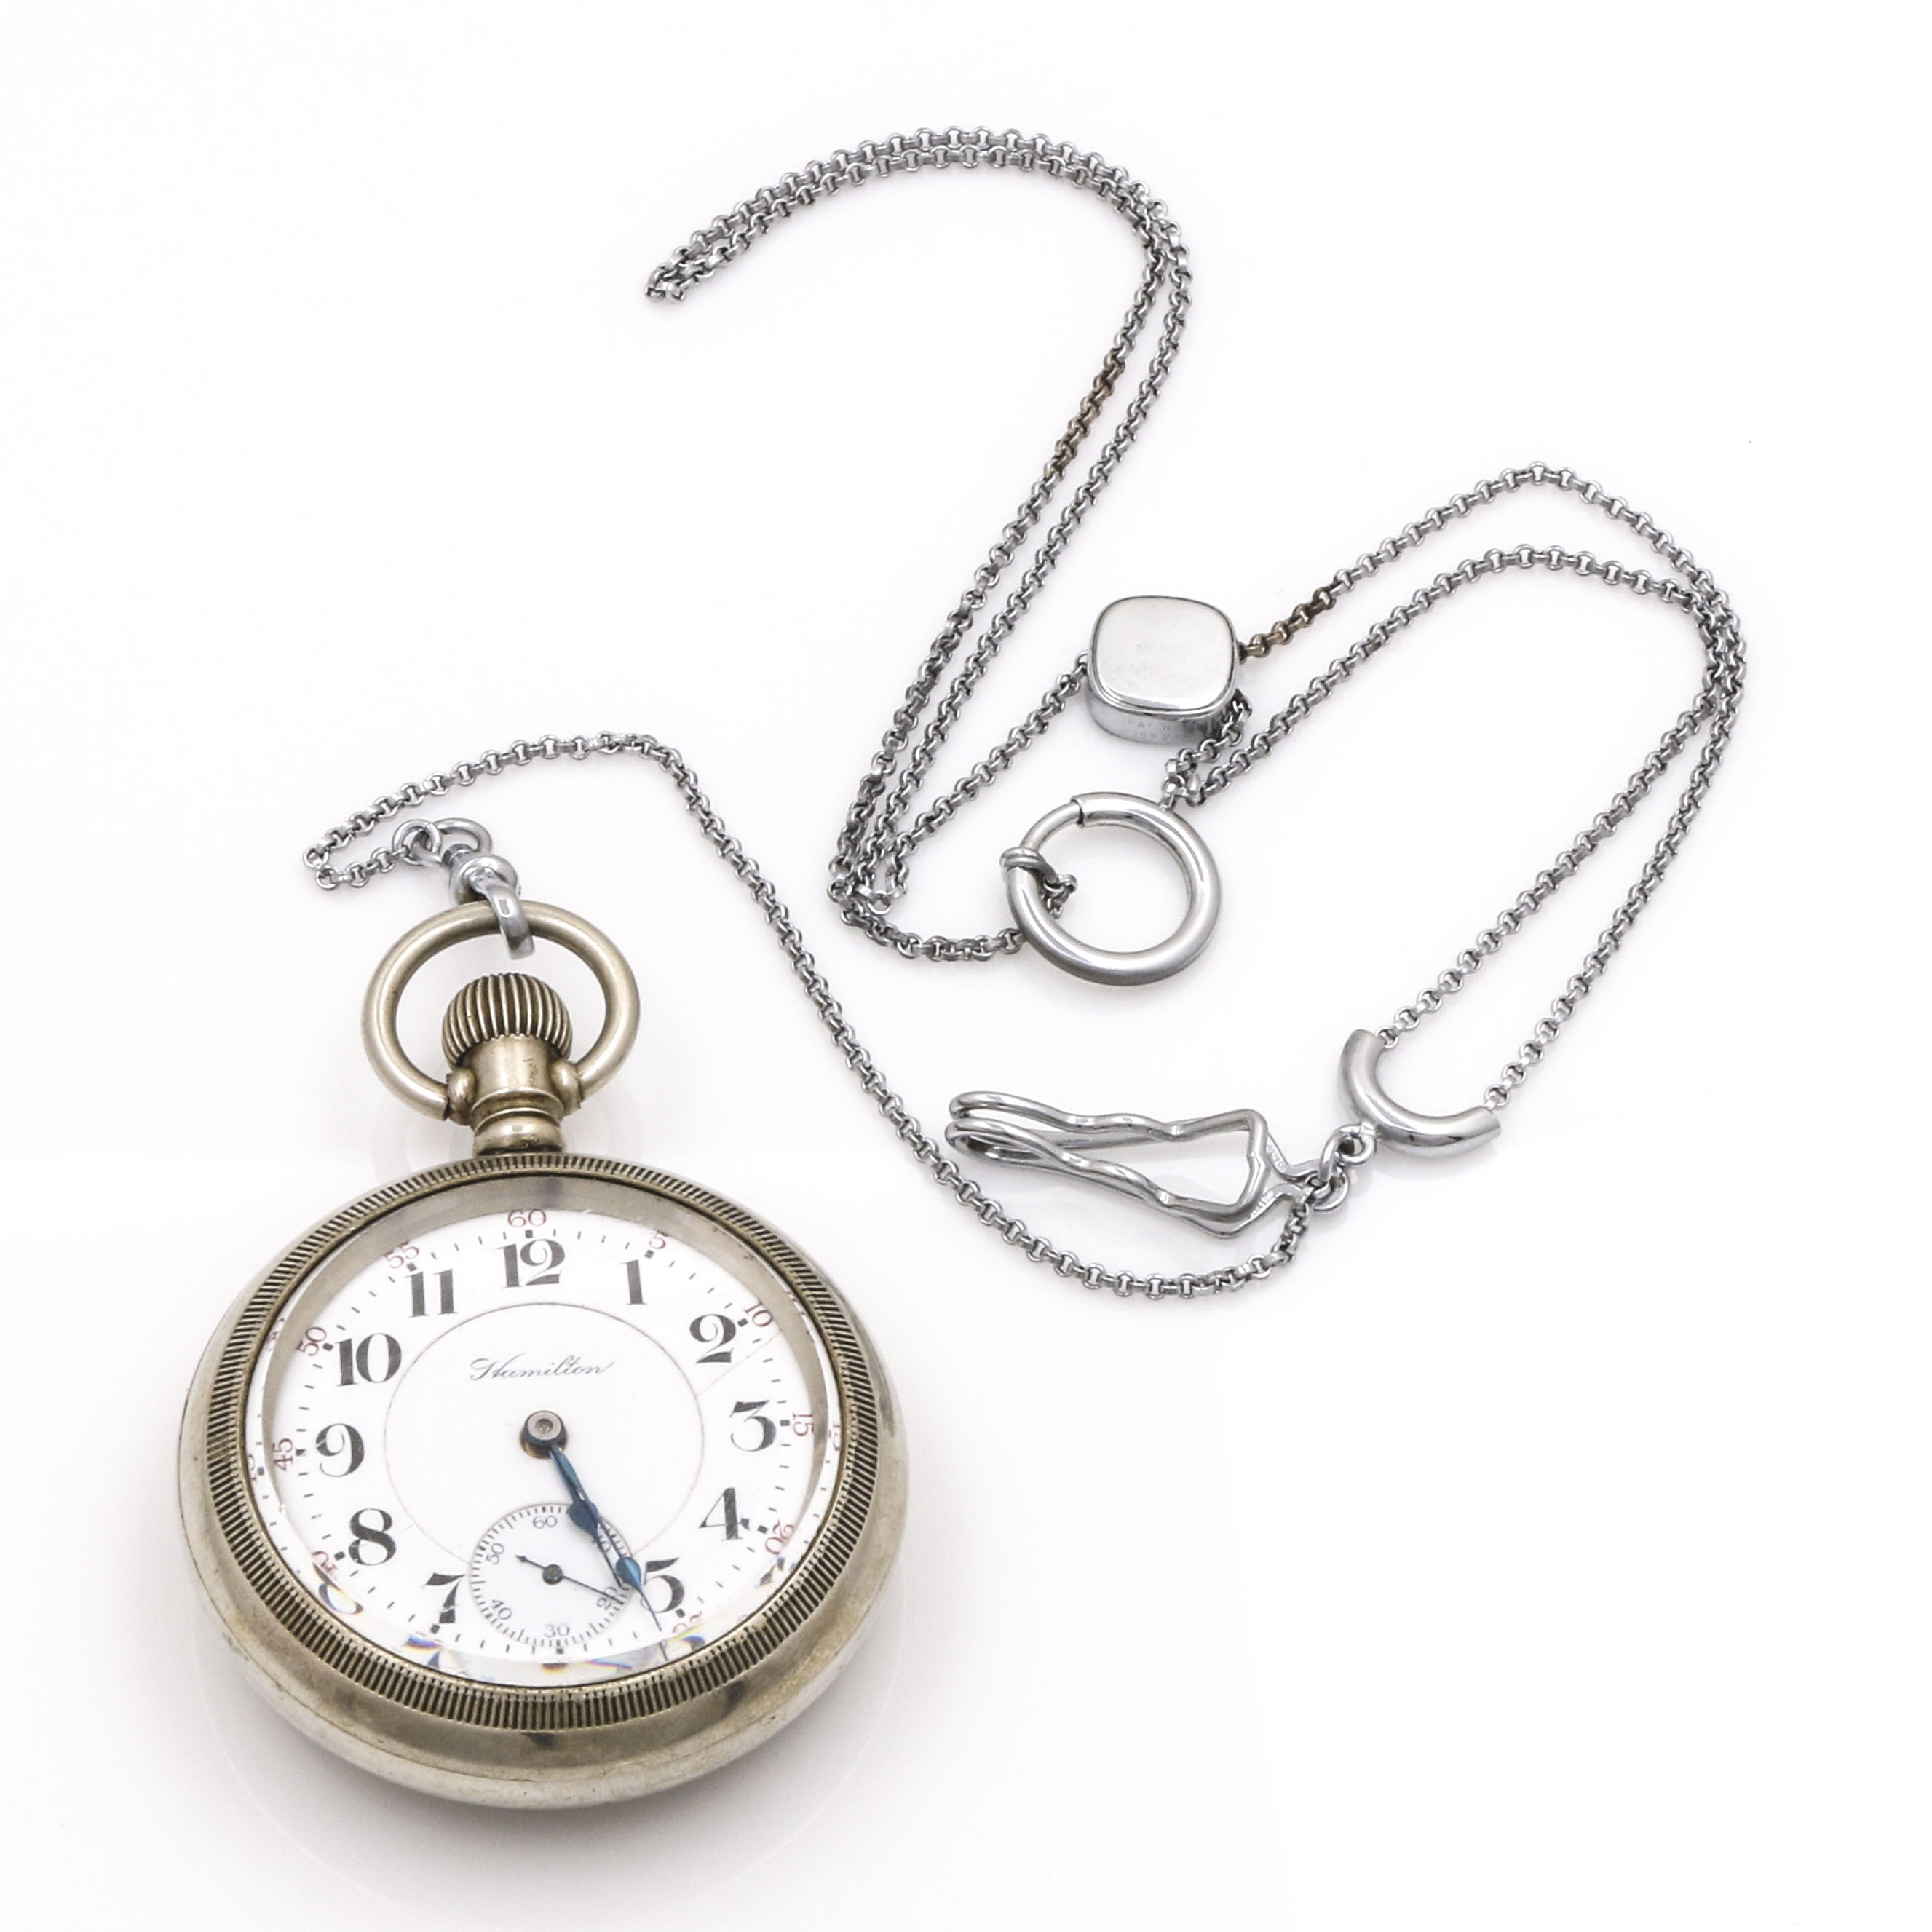 Silverode Hamilton Pocket Watch